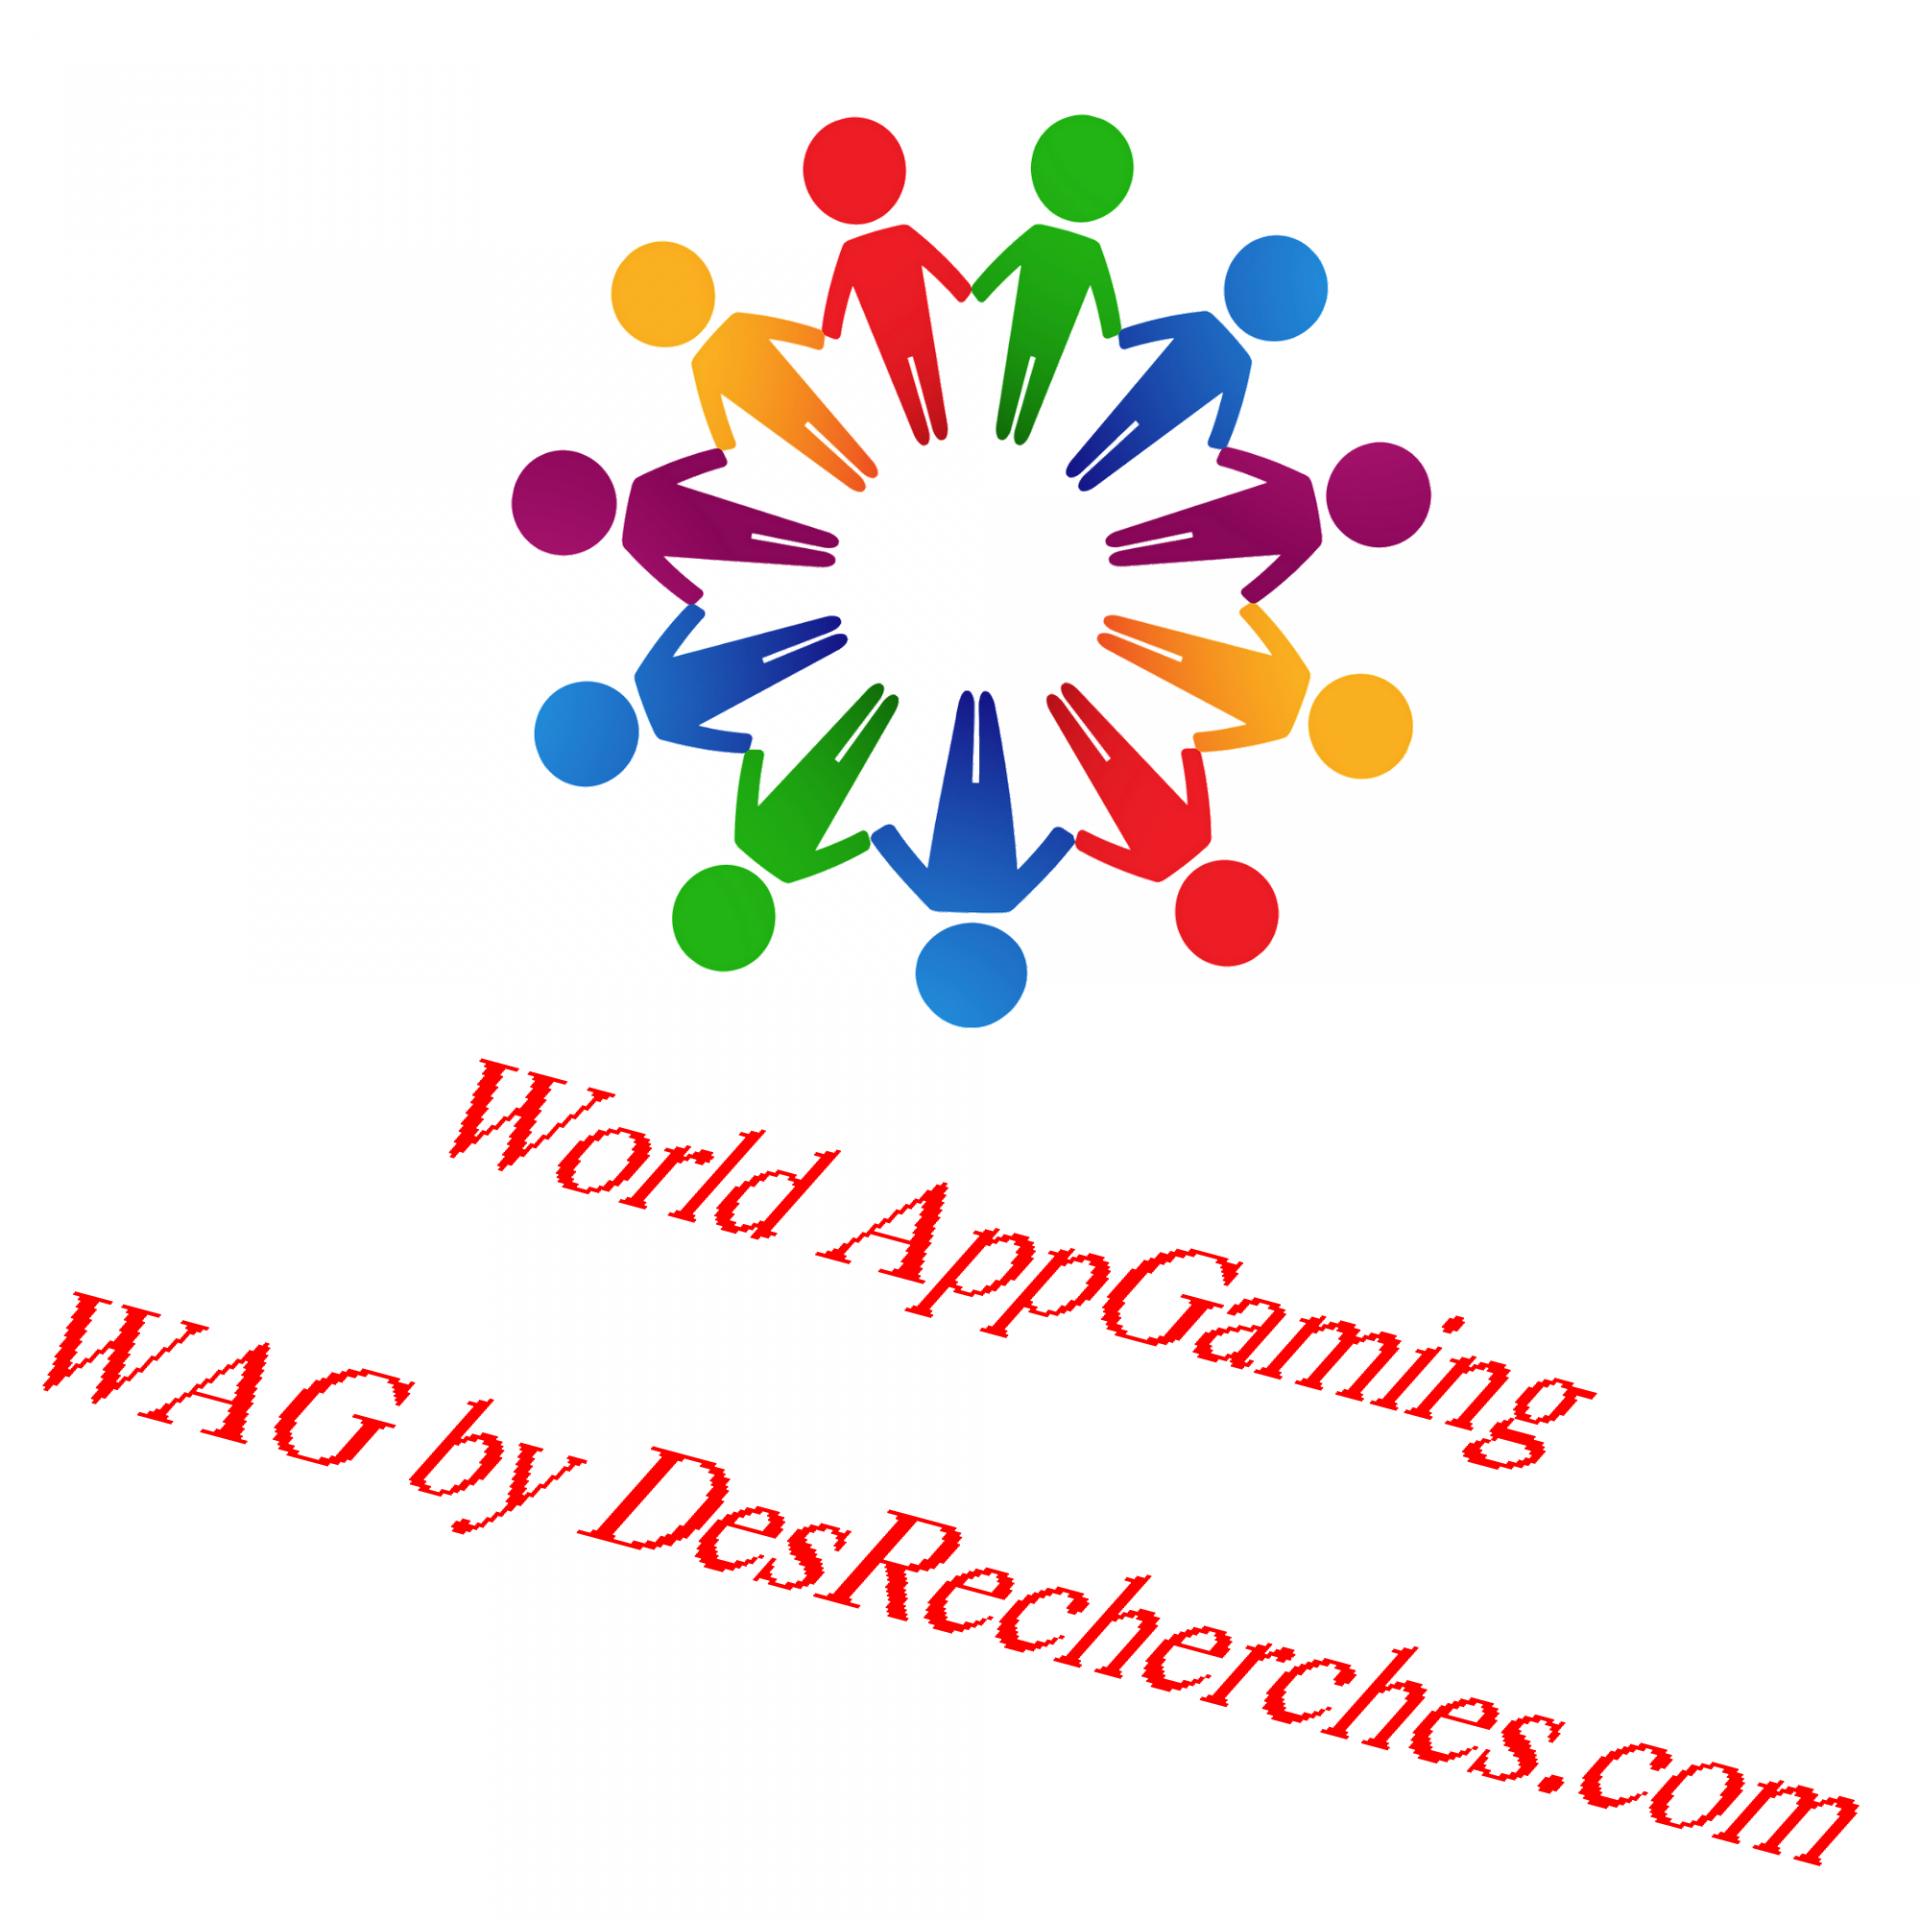 Logo de WAG by DesRecherches com - 1